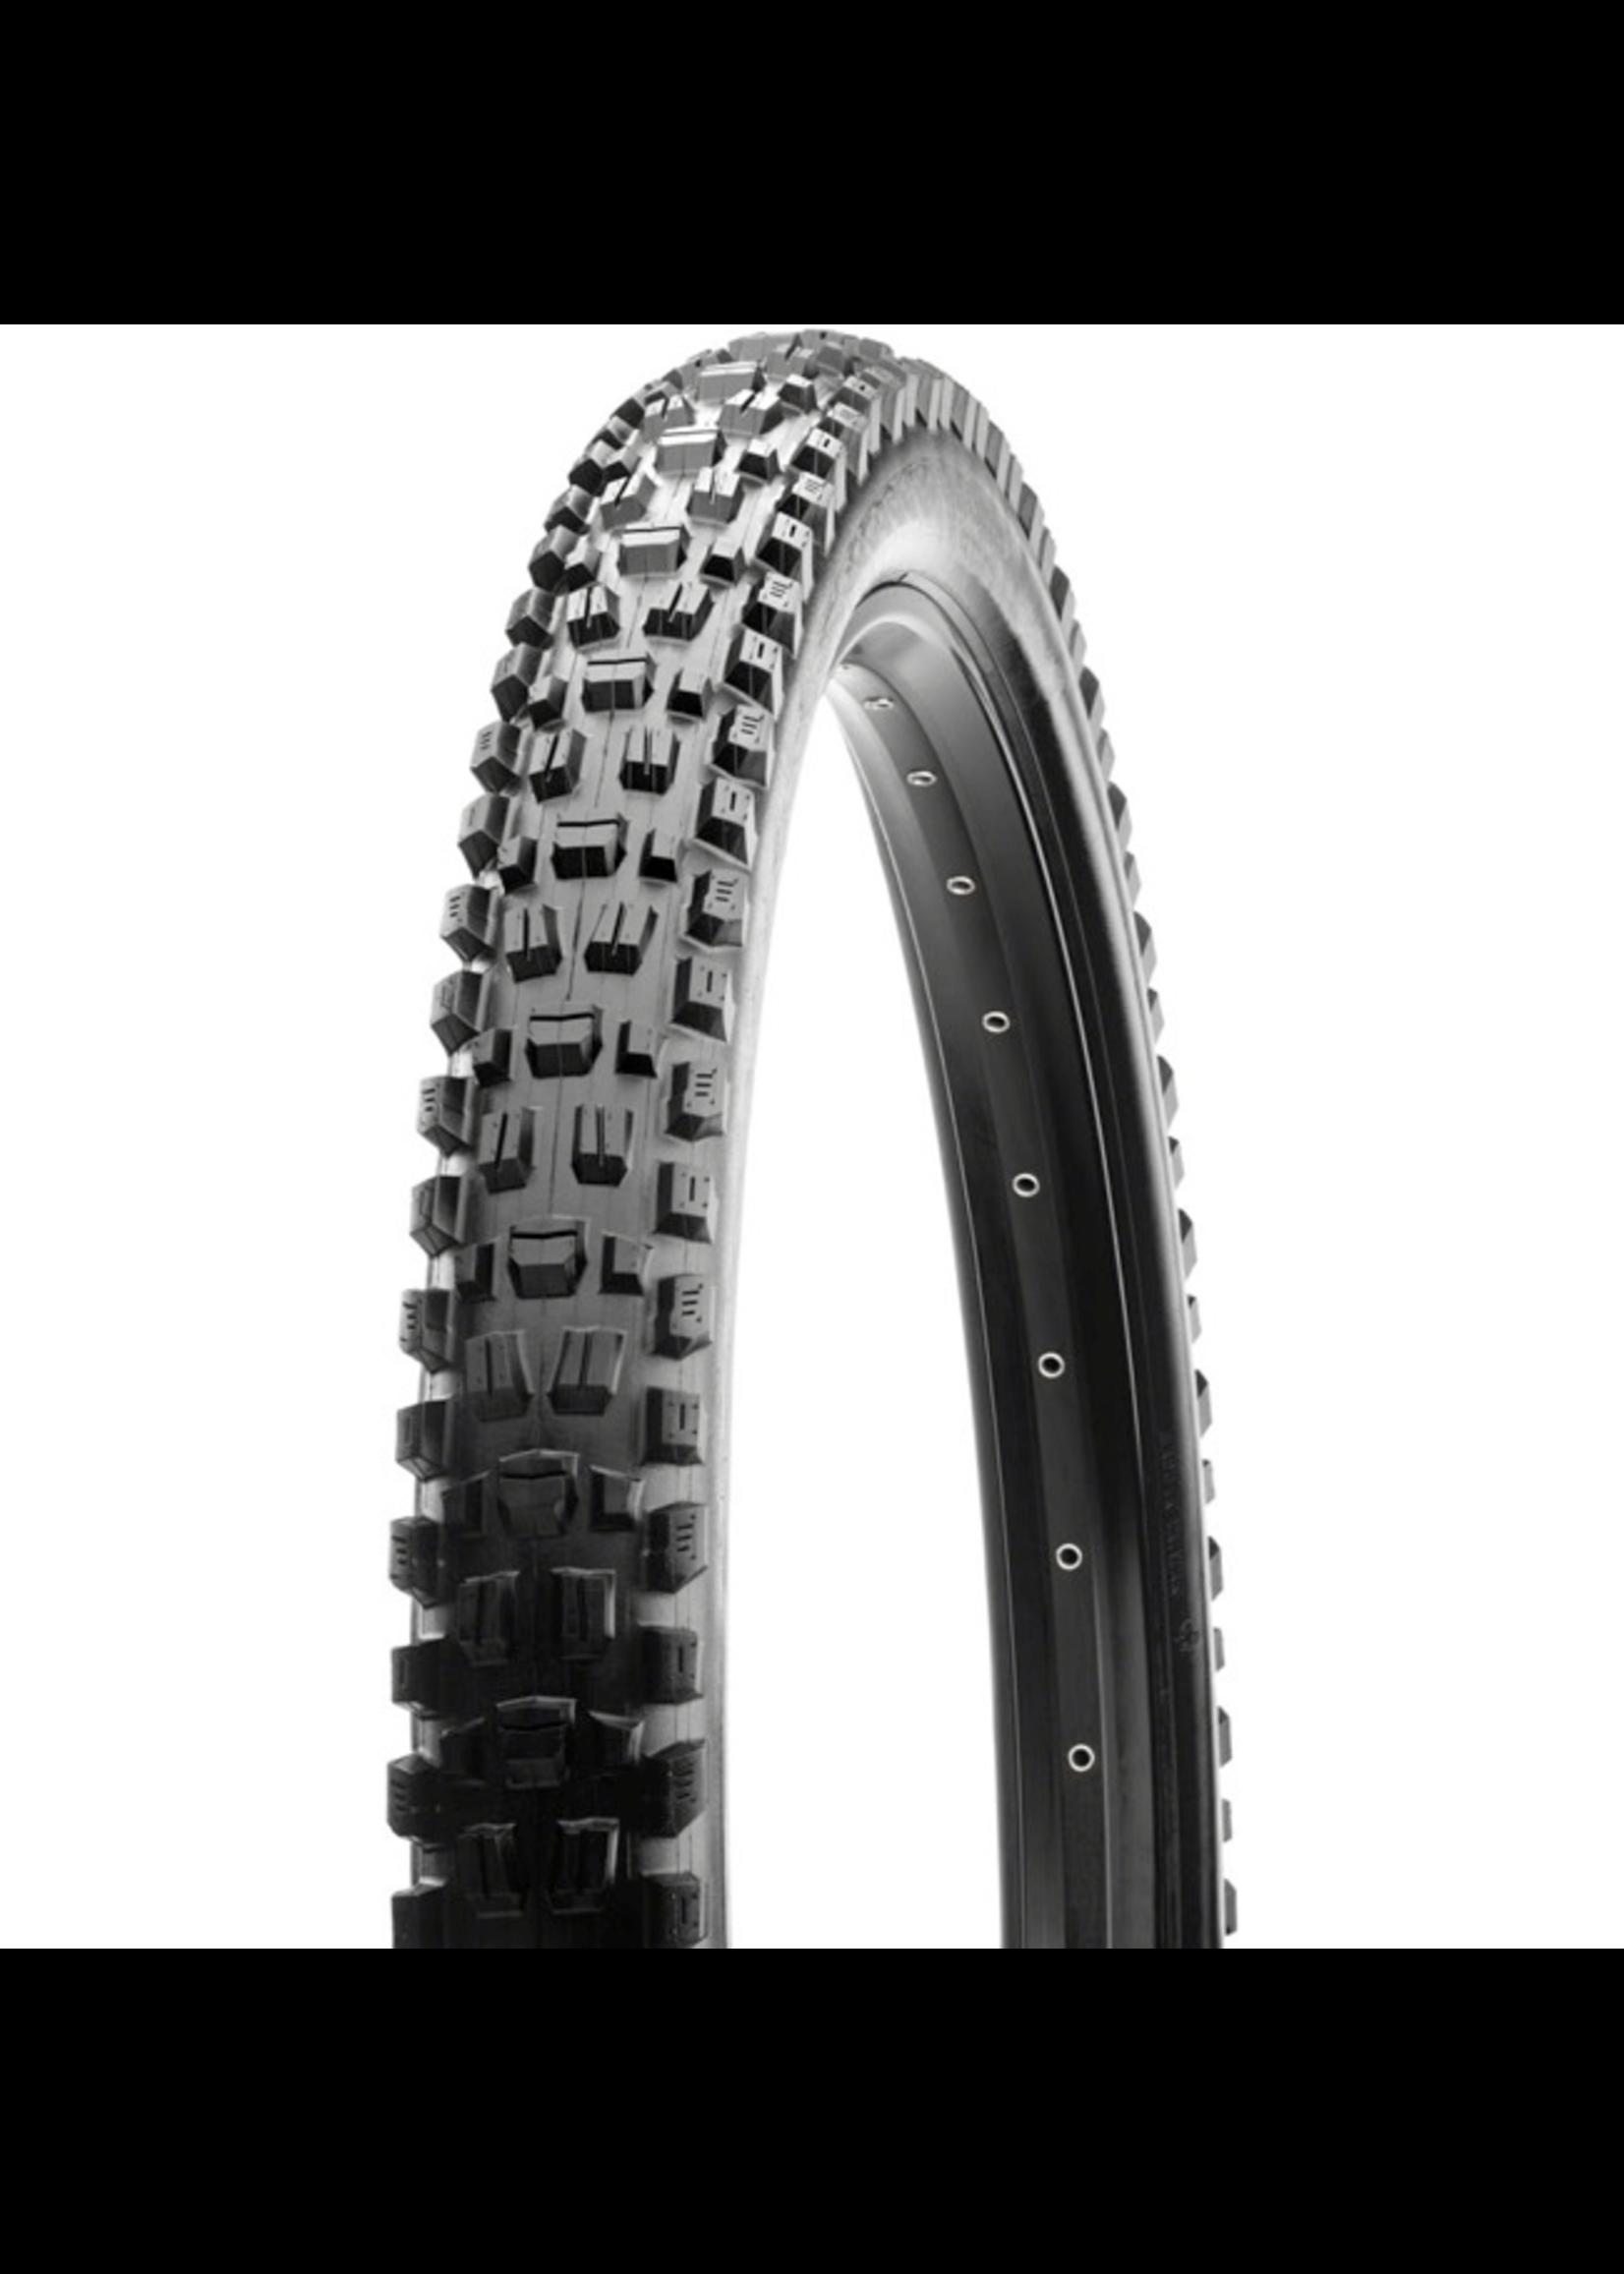 Maxxis Maxxis, Assegai, Tire, 27.5''x2.50, Folding, Tubeless Ready, 3C Maxx Grip, EXO+, Wide Trail, 120TPI, Black